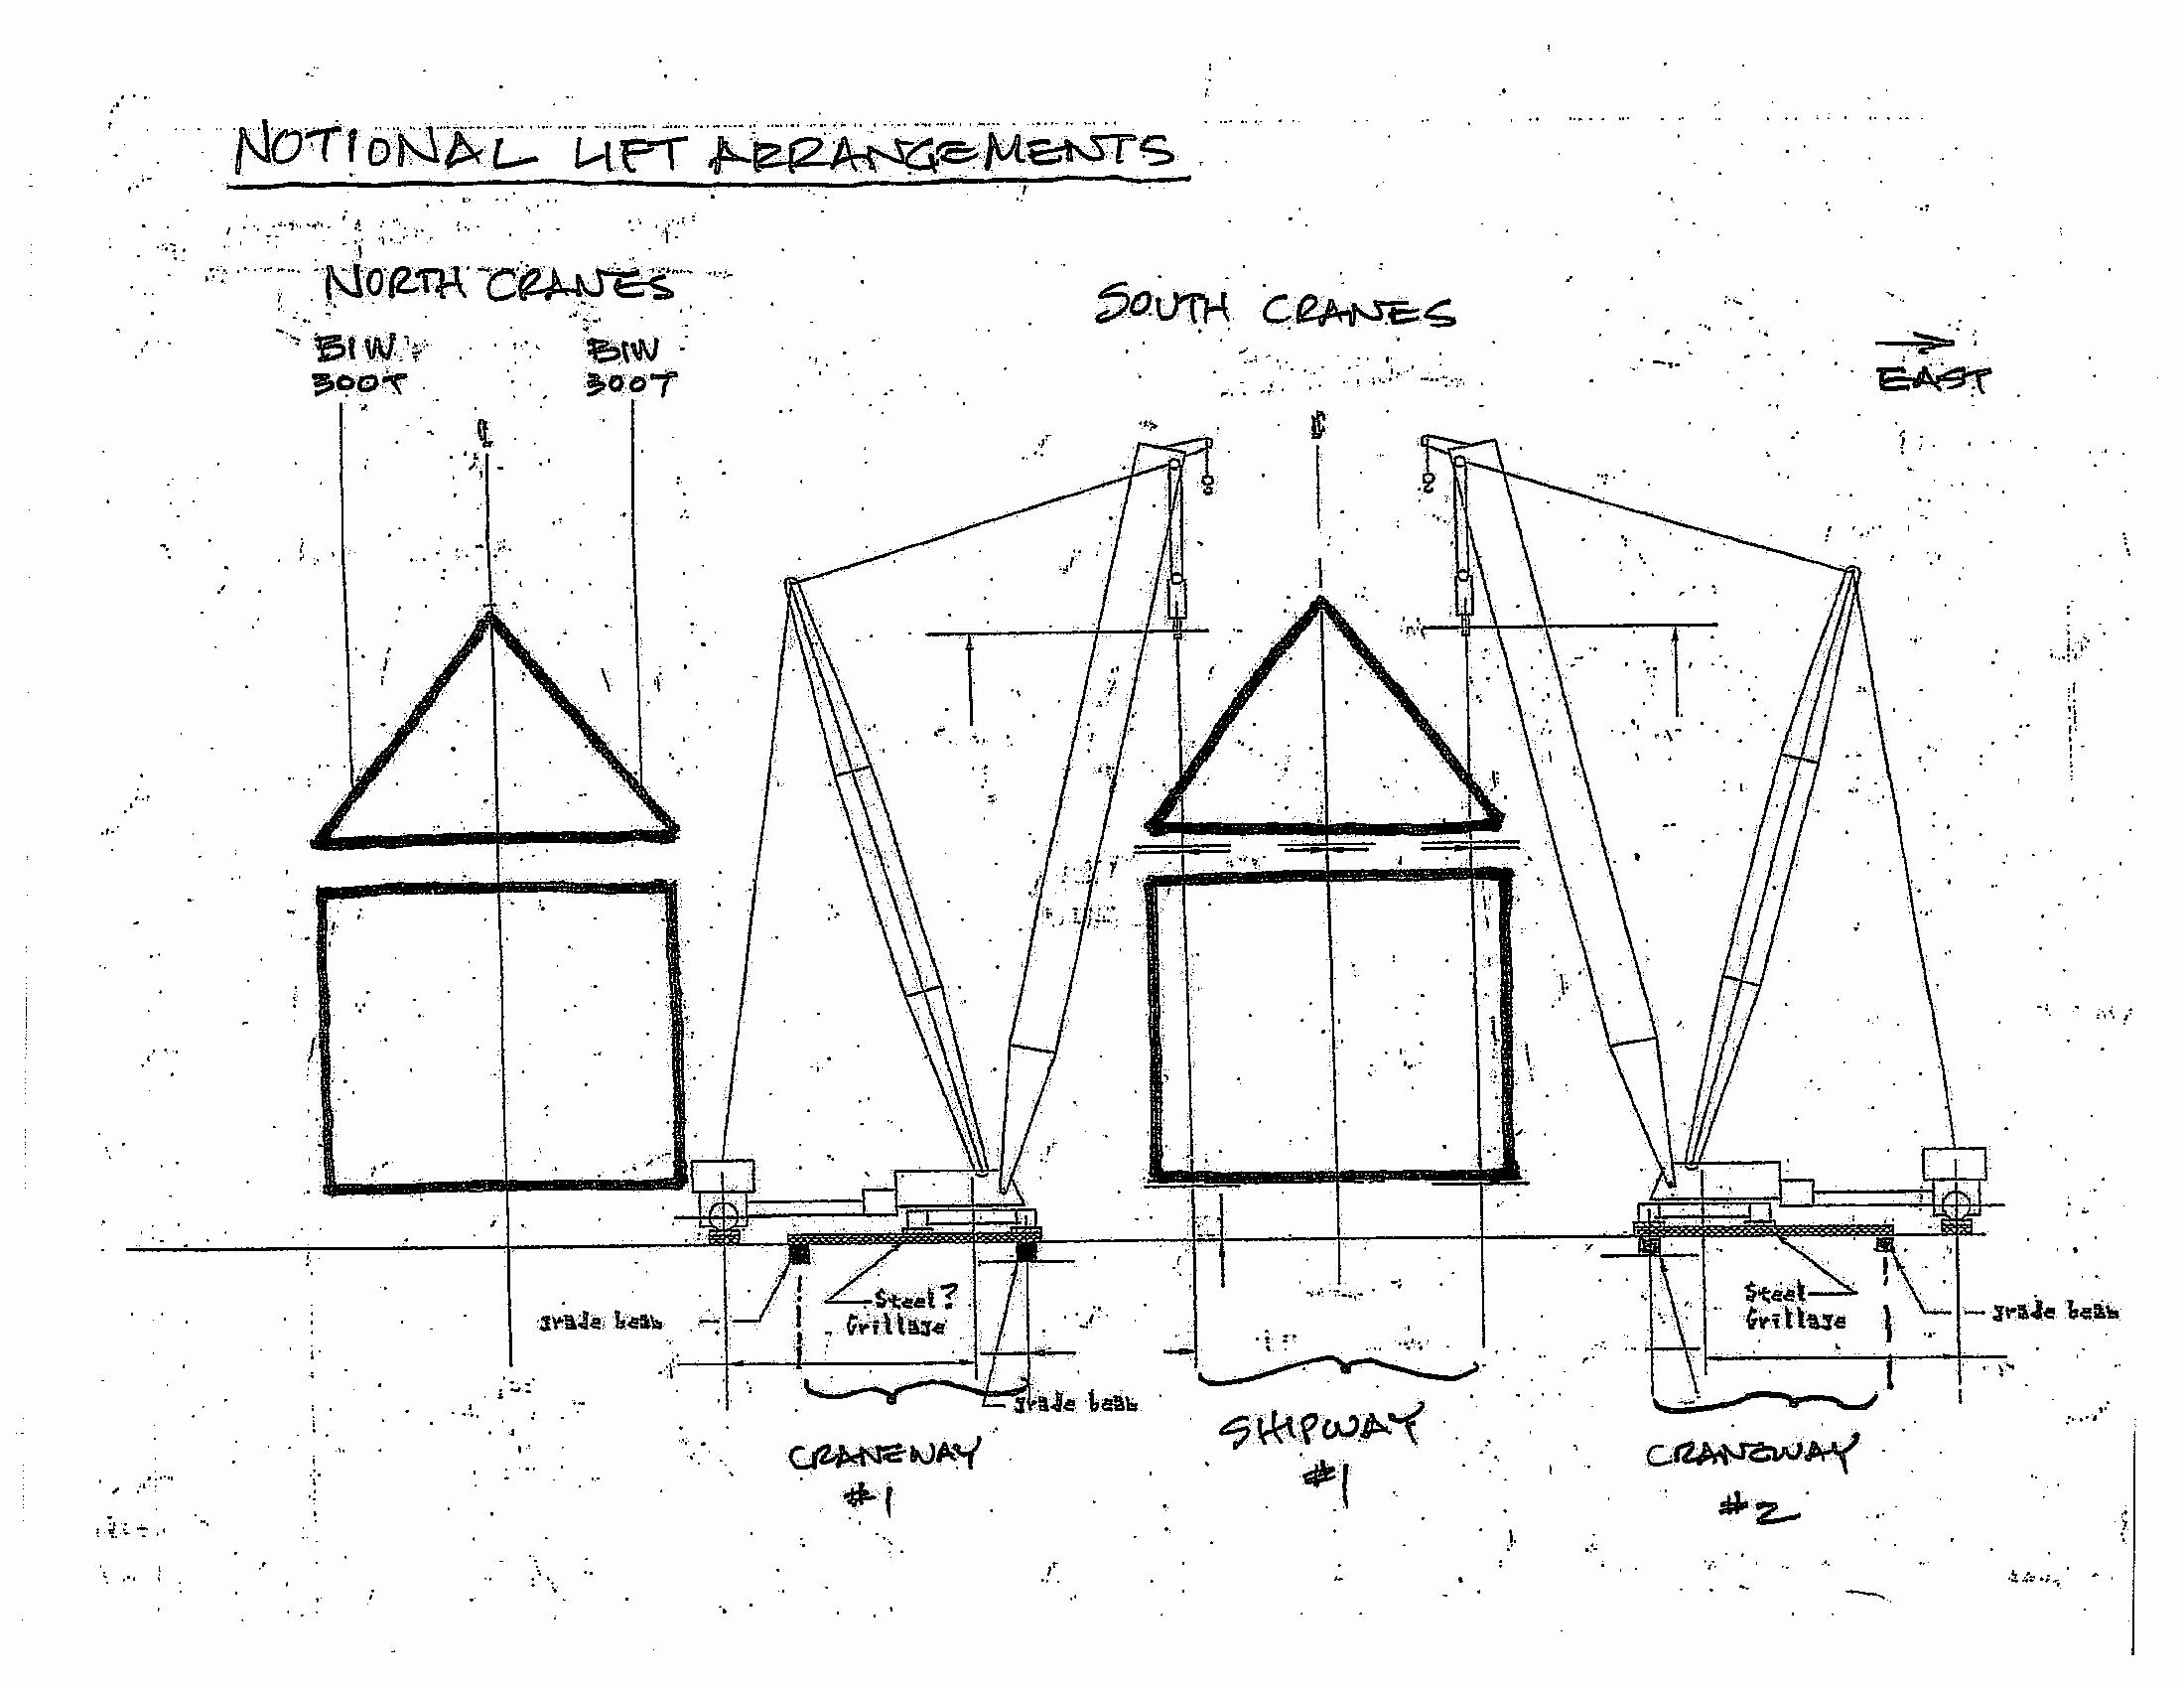 Crane Lifting Plan Template Luxury How to Setup Cad Based Crane Lift Plans